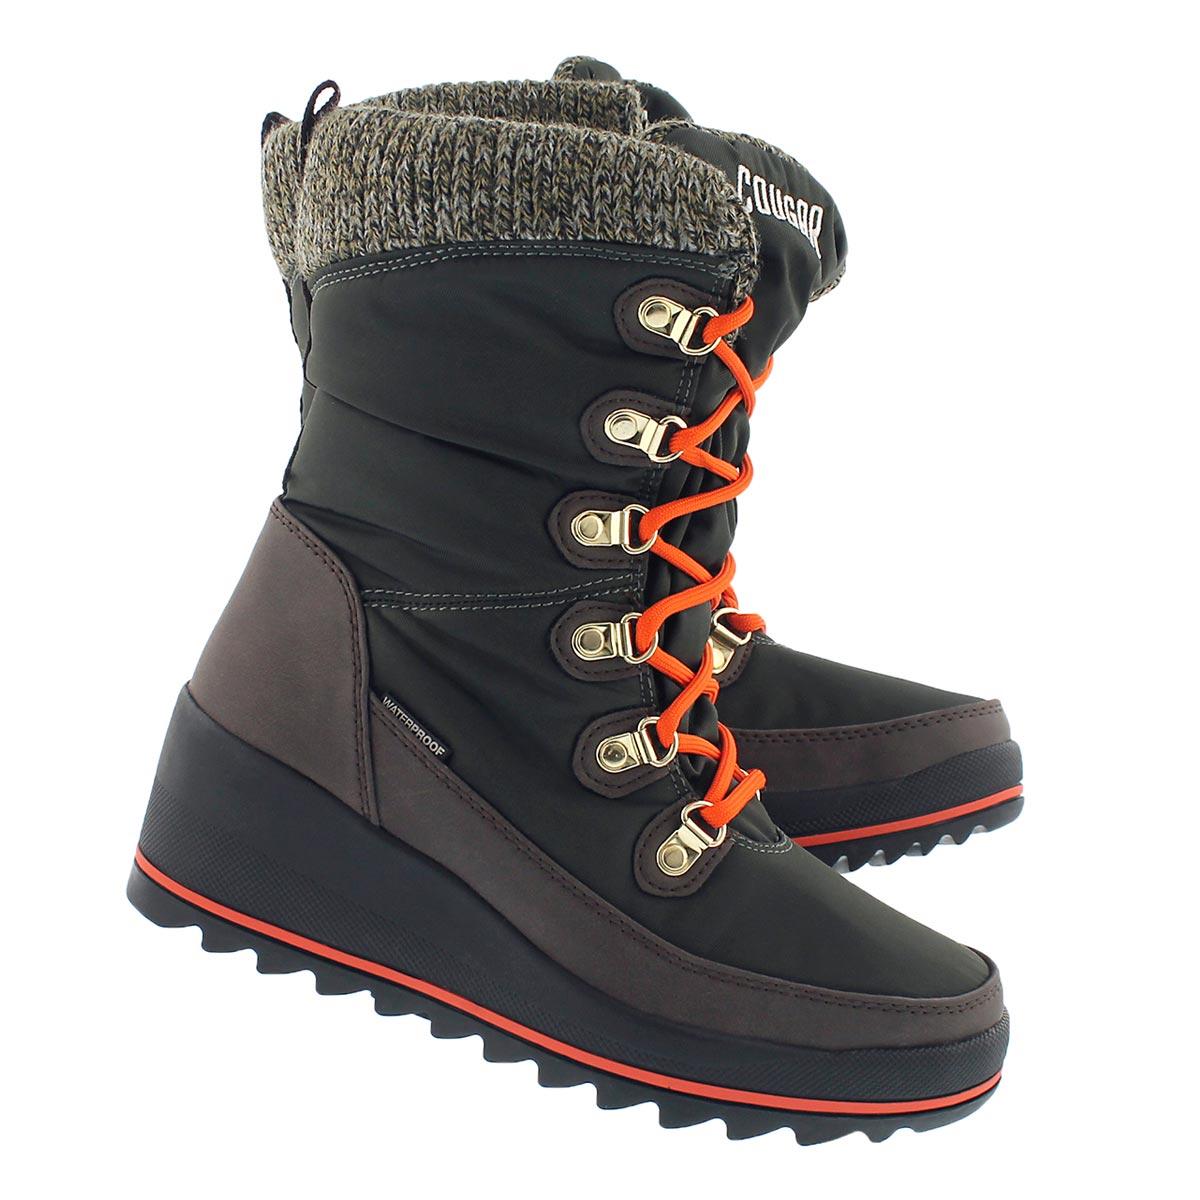 Lds Layne khaki wtpf pull on winter boot